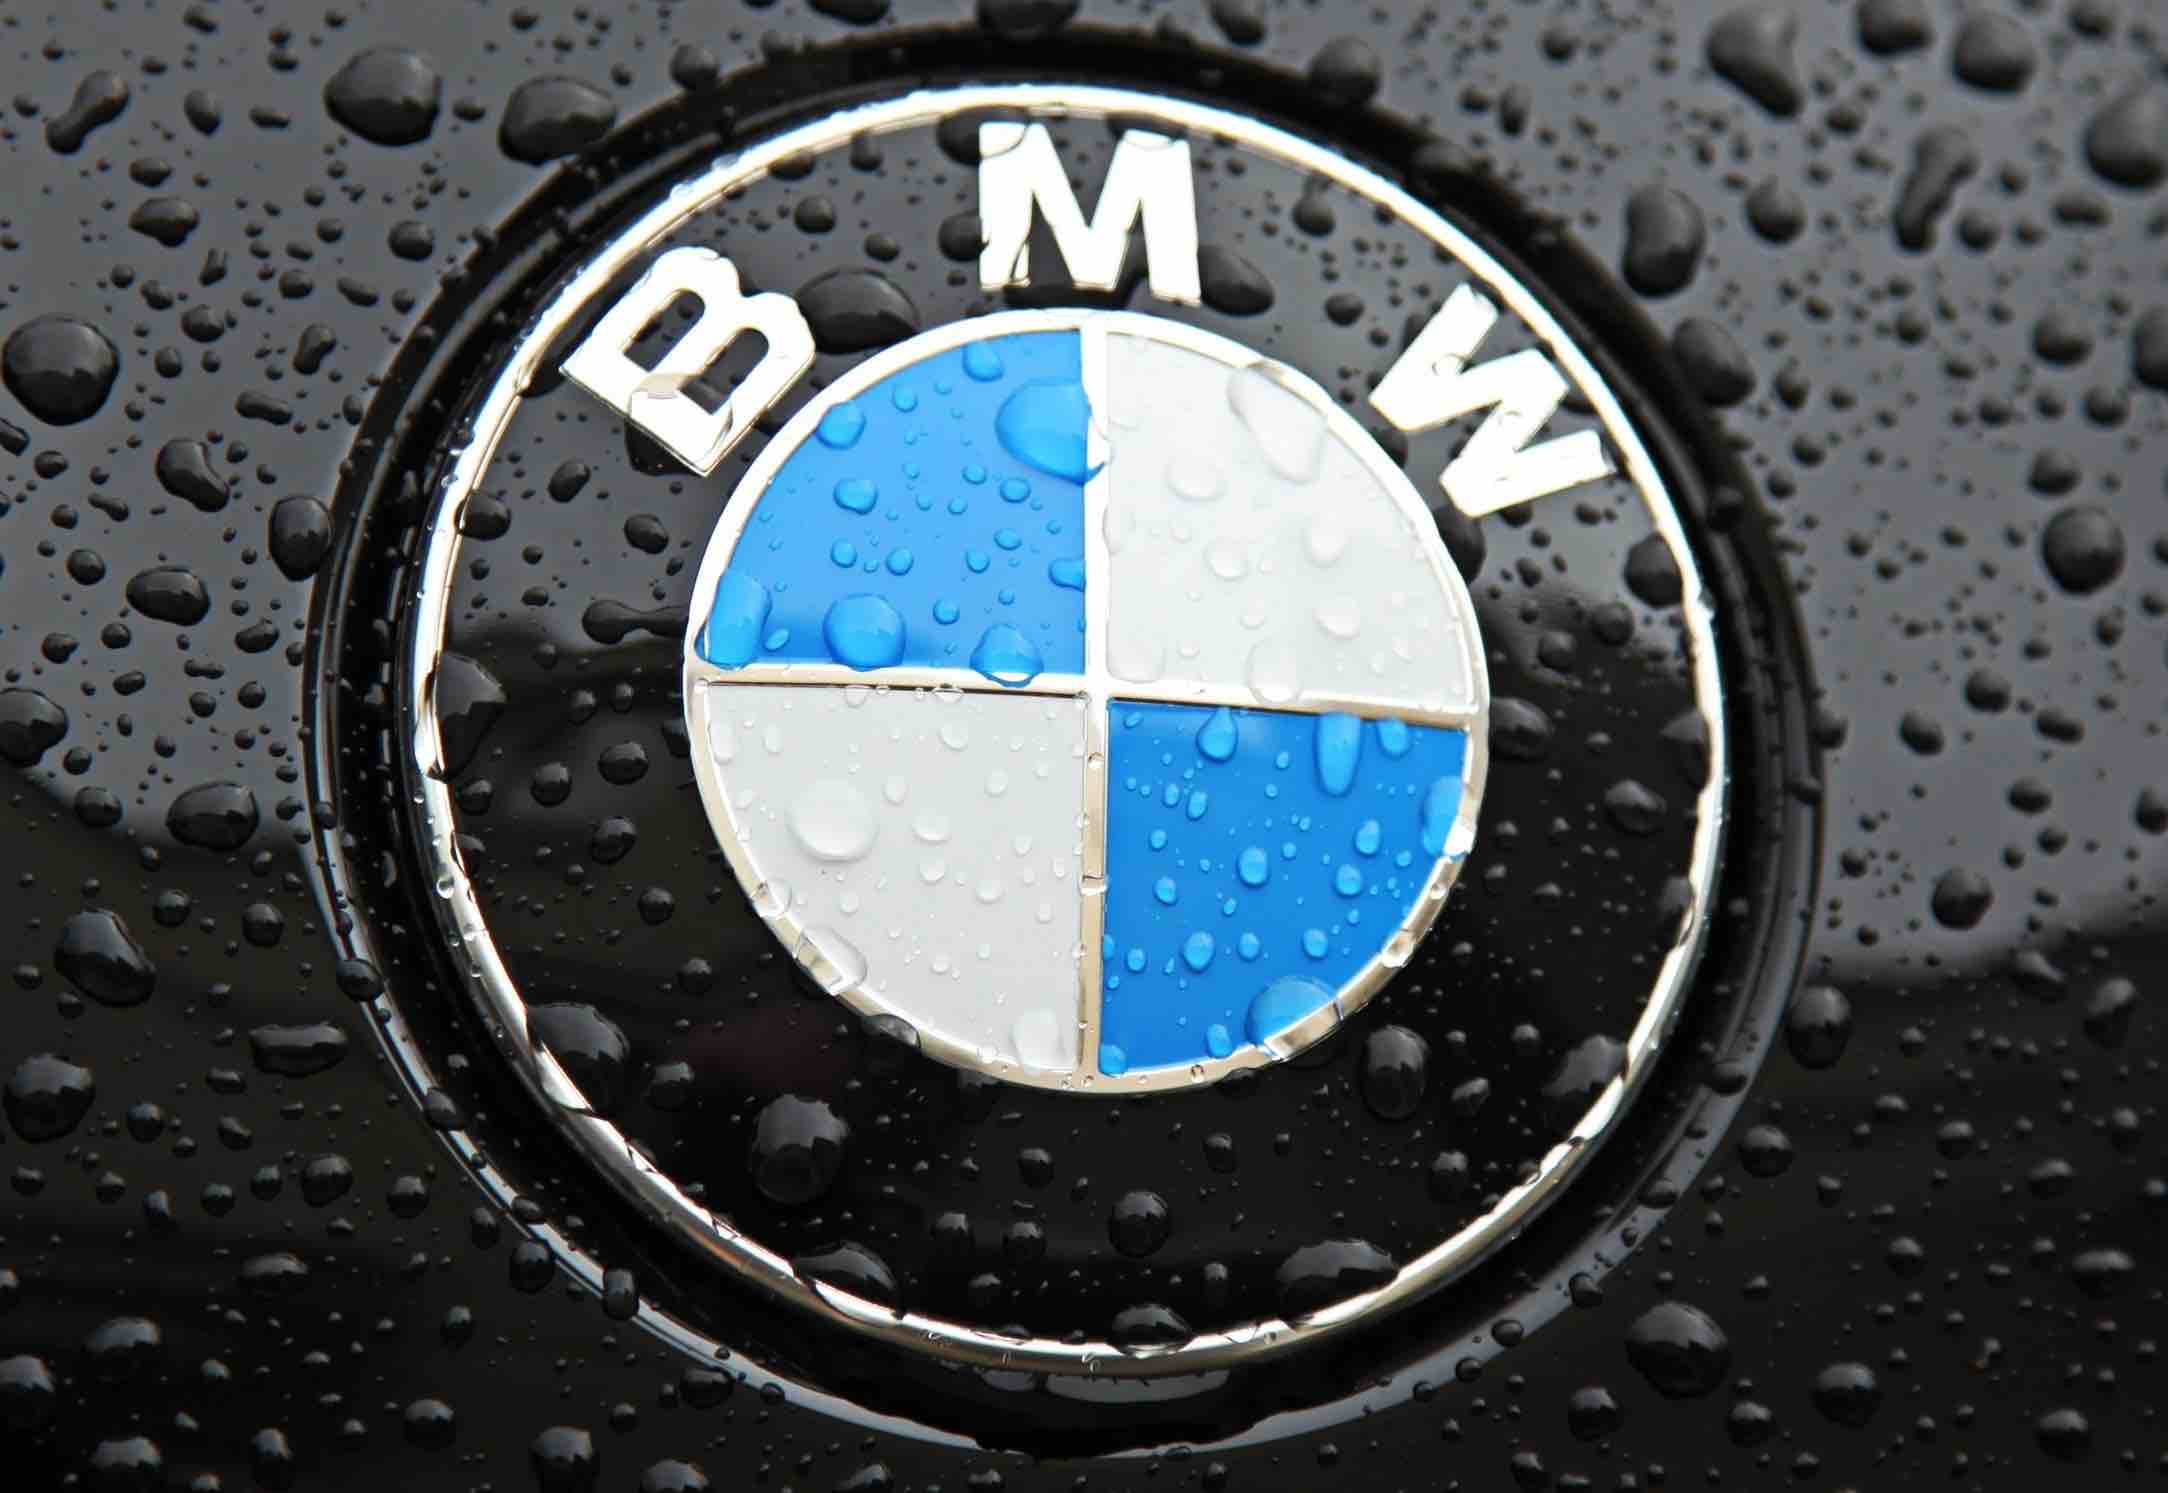 Bmw Diesels In The Crosshairs Now Epautos Libertarian Car Talk